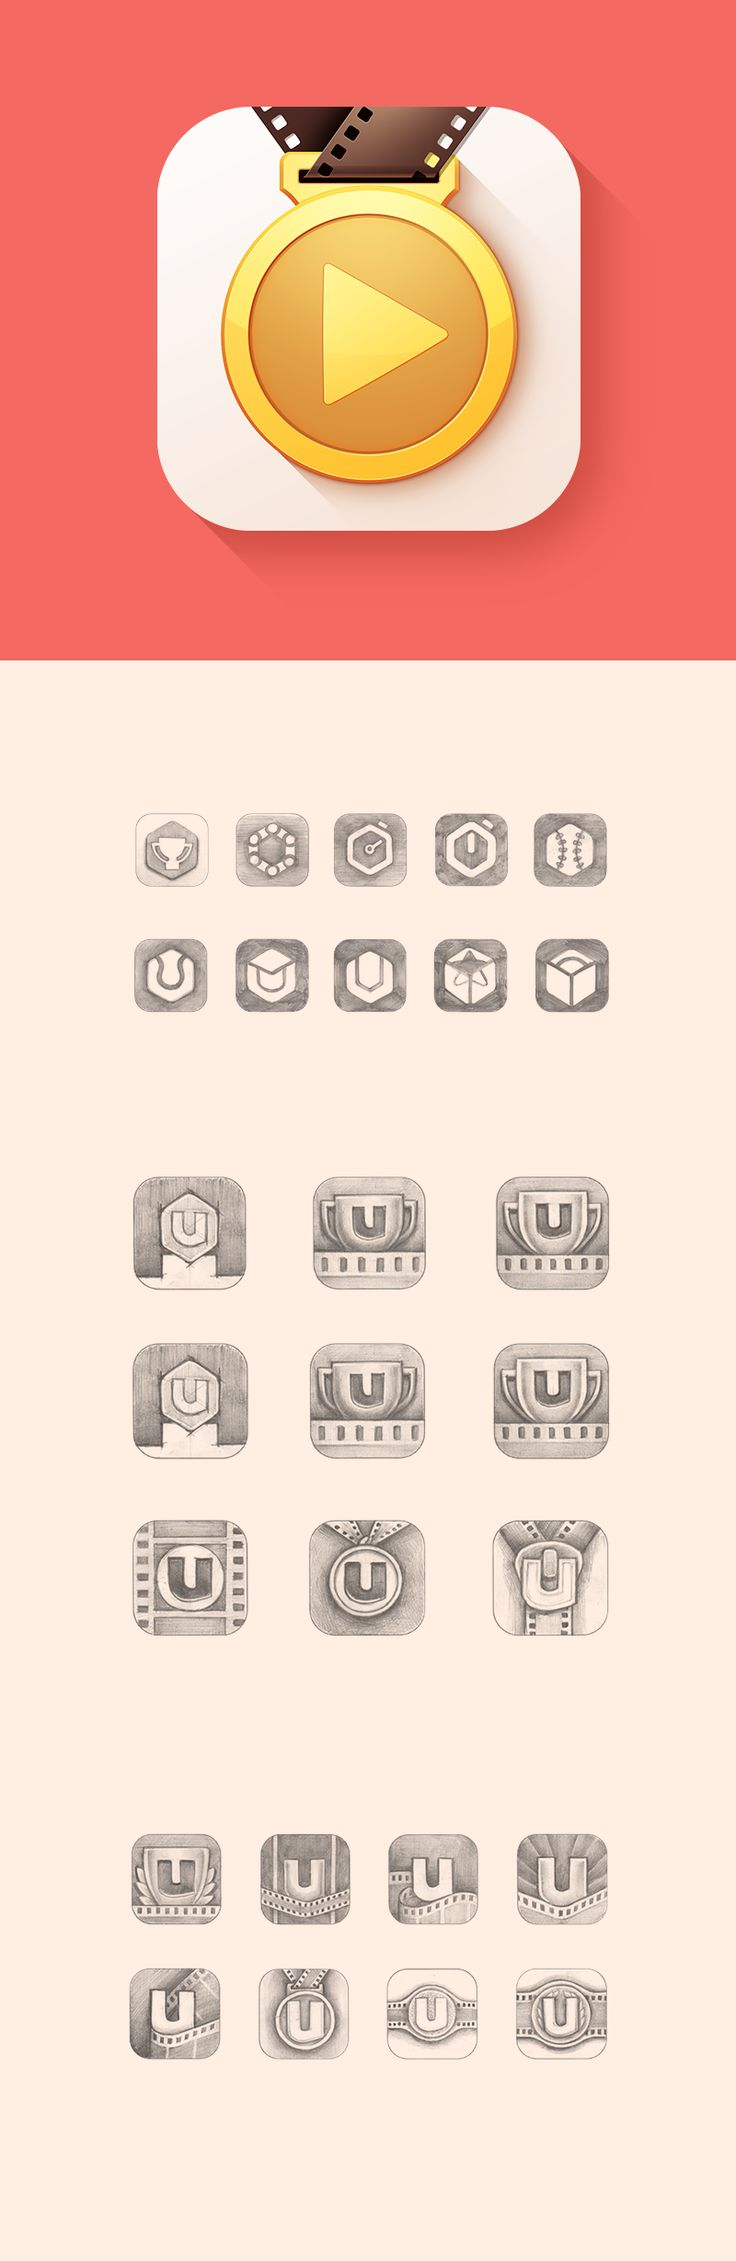 Dribbble social app ui design jpg by ramotion - Coaching App Icon Design